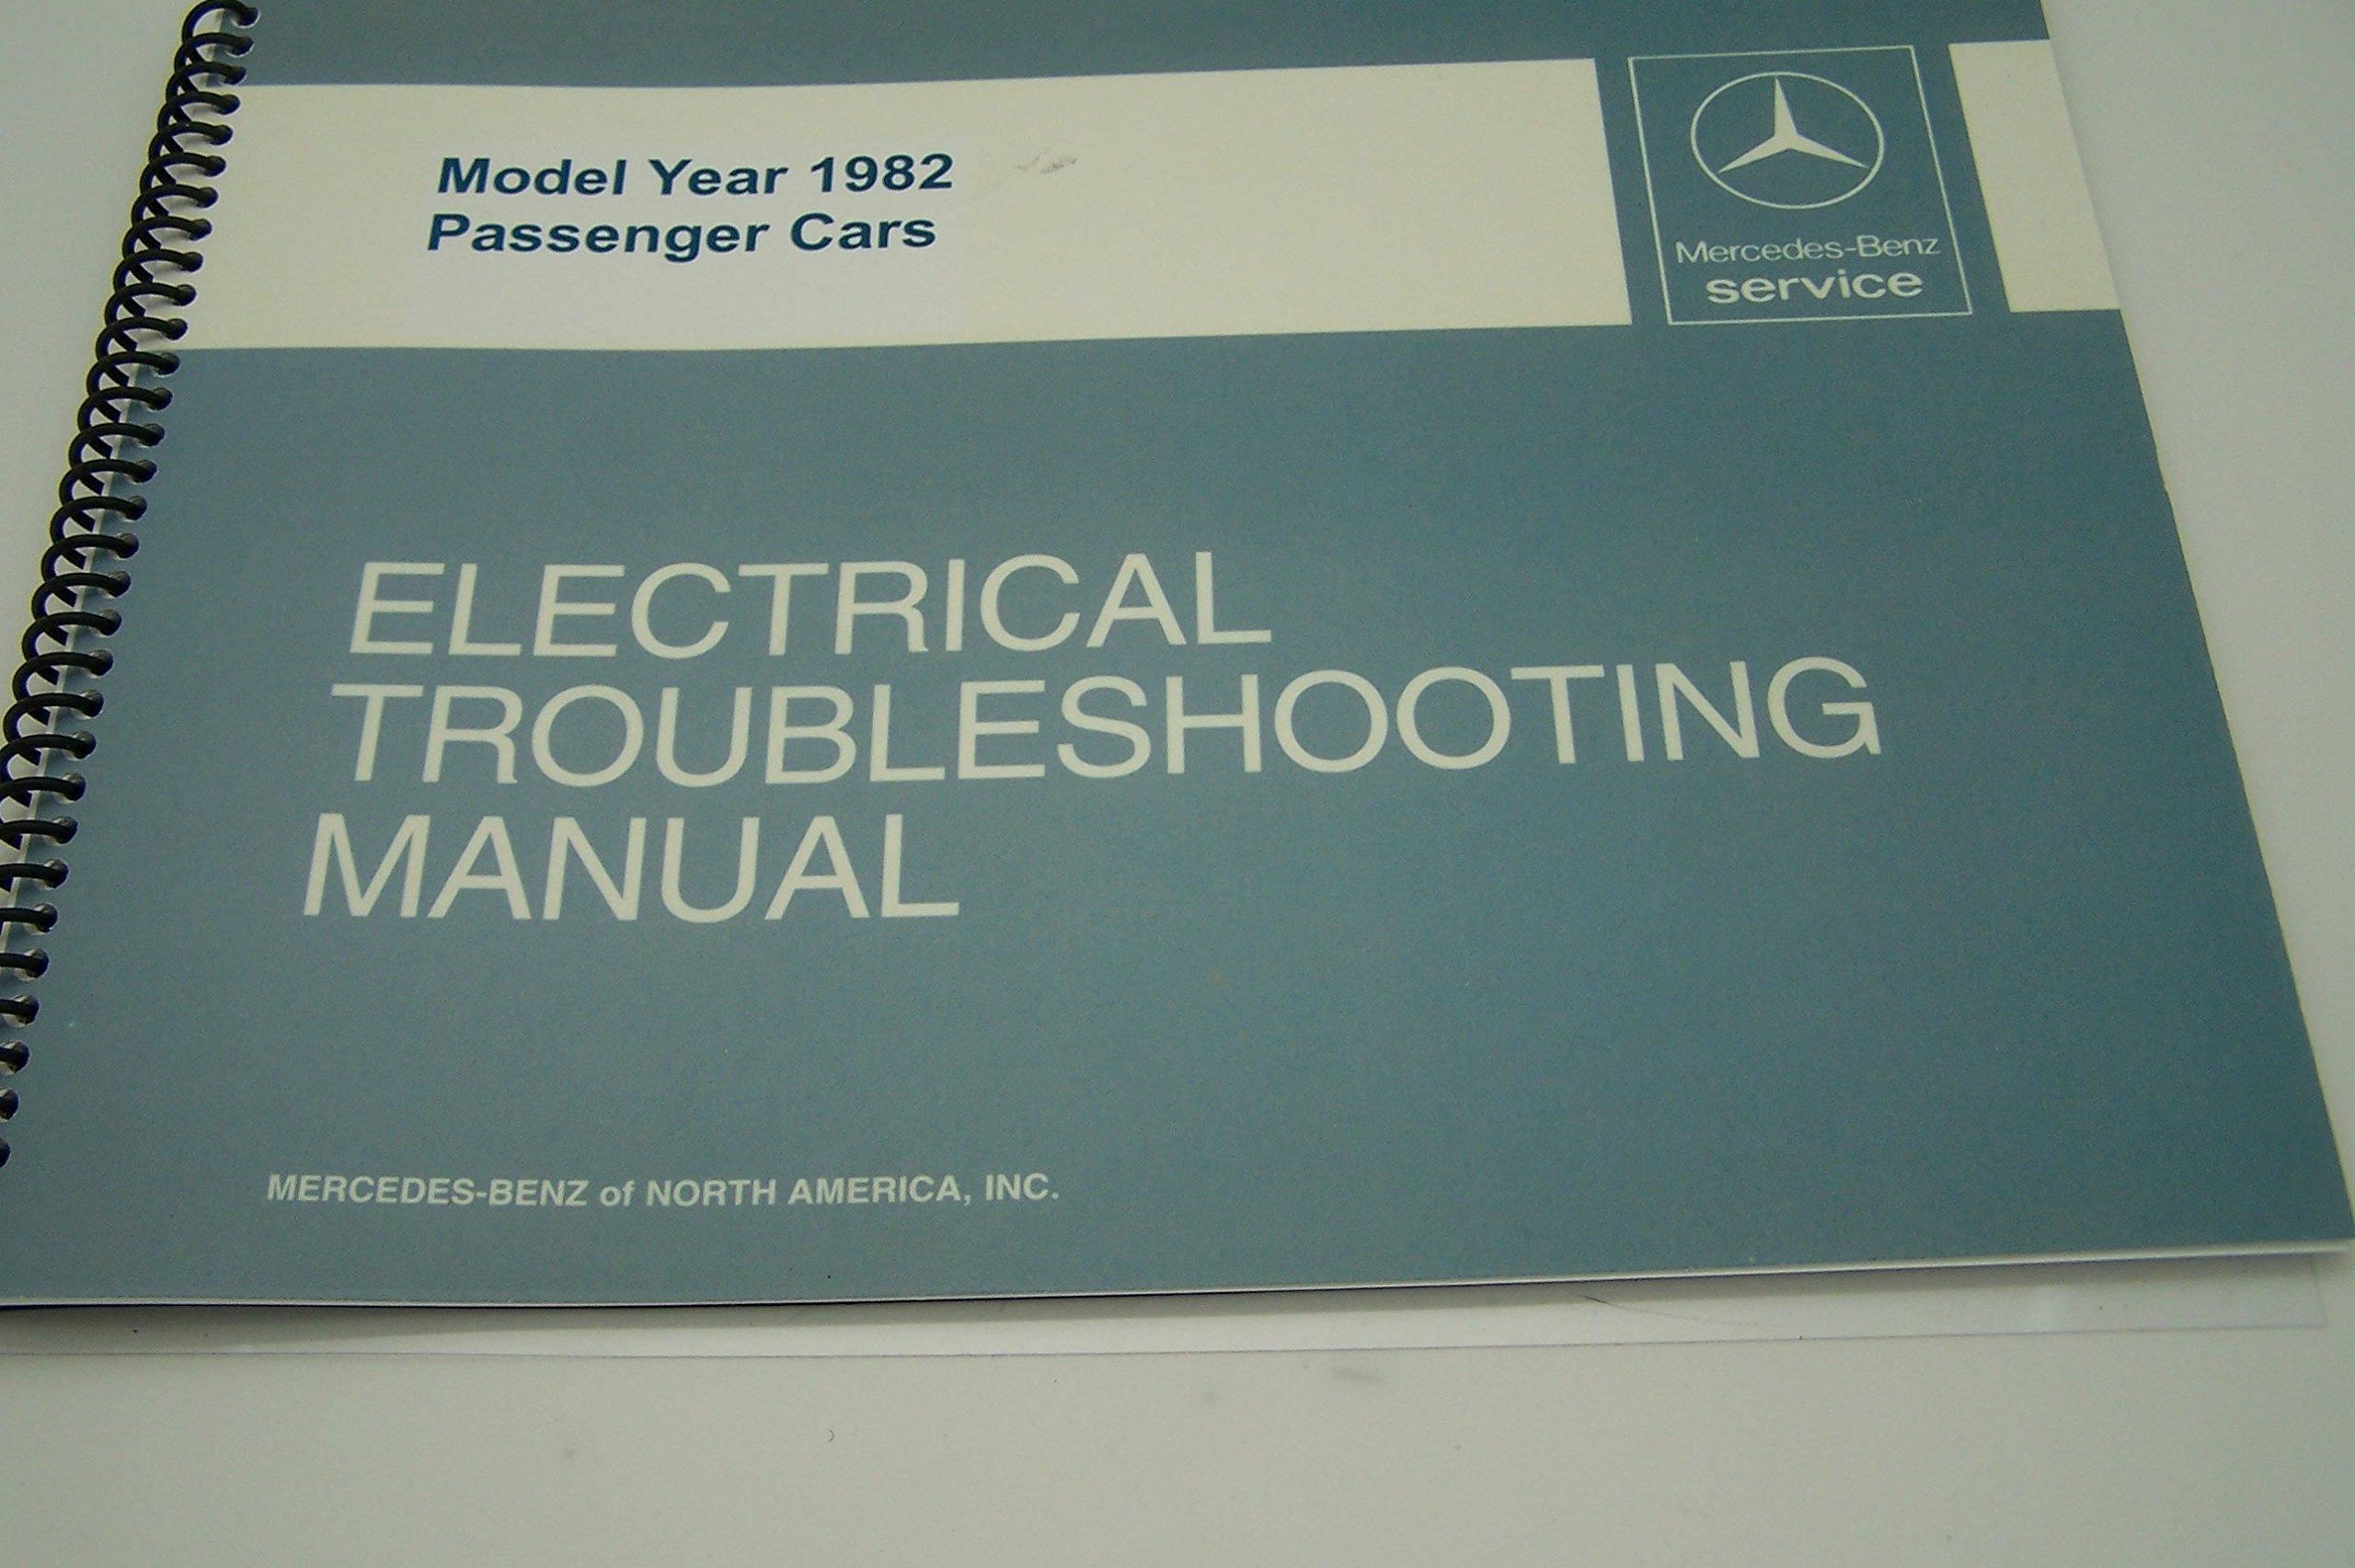 1982 Mercedes Electrical Service Manual 300d 300cd 300td turbo W123: 0617215835749: Amazon.com: Books